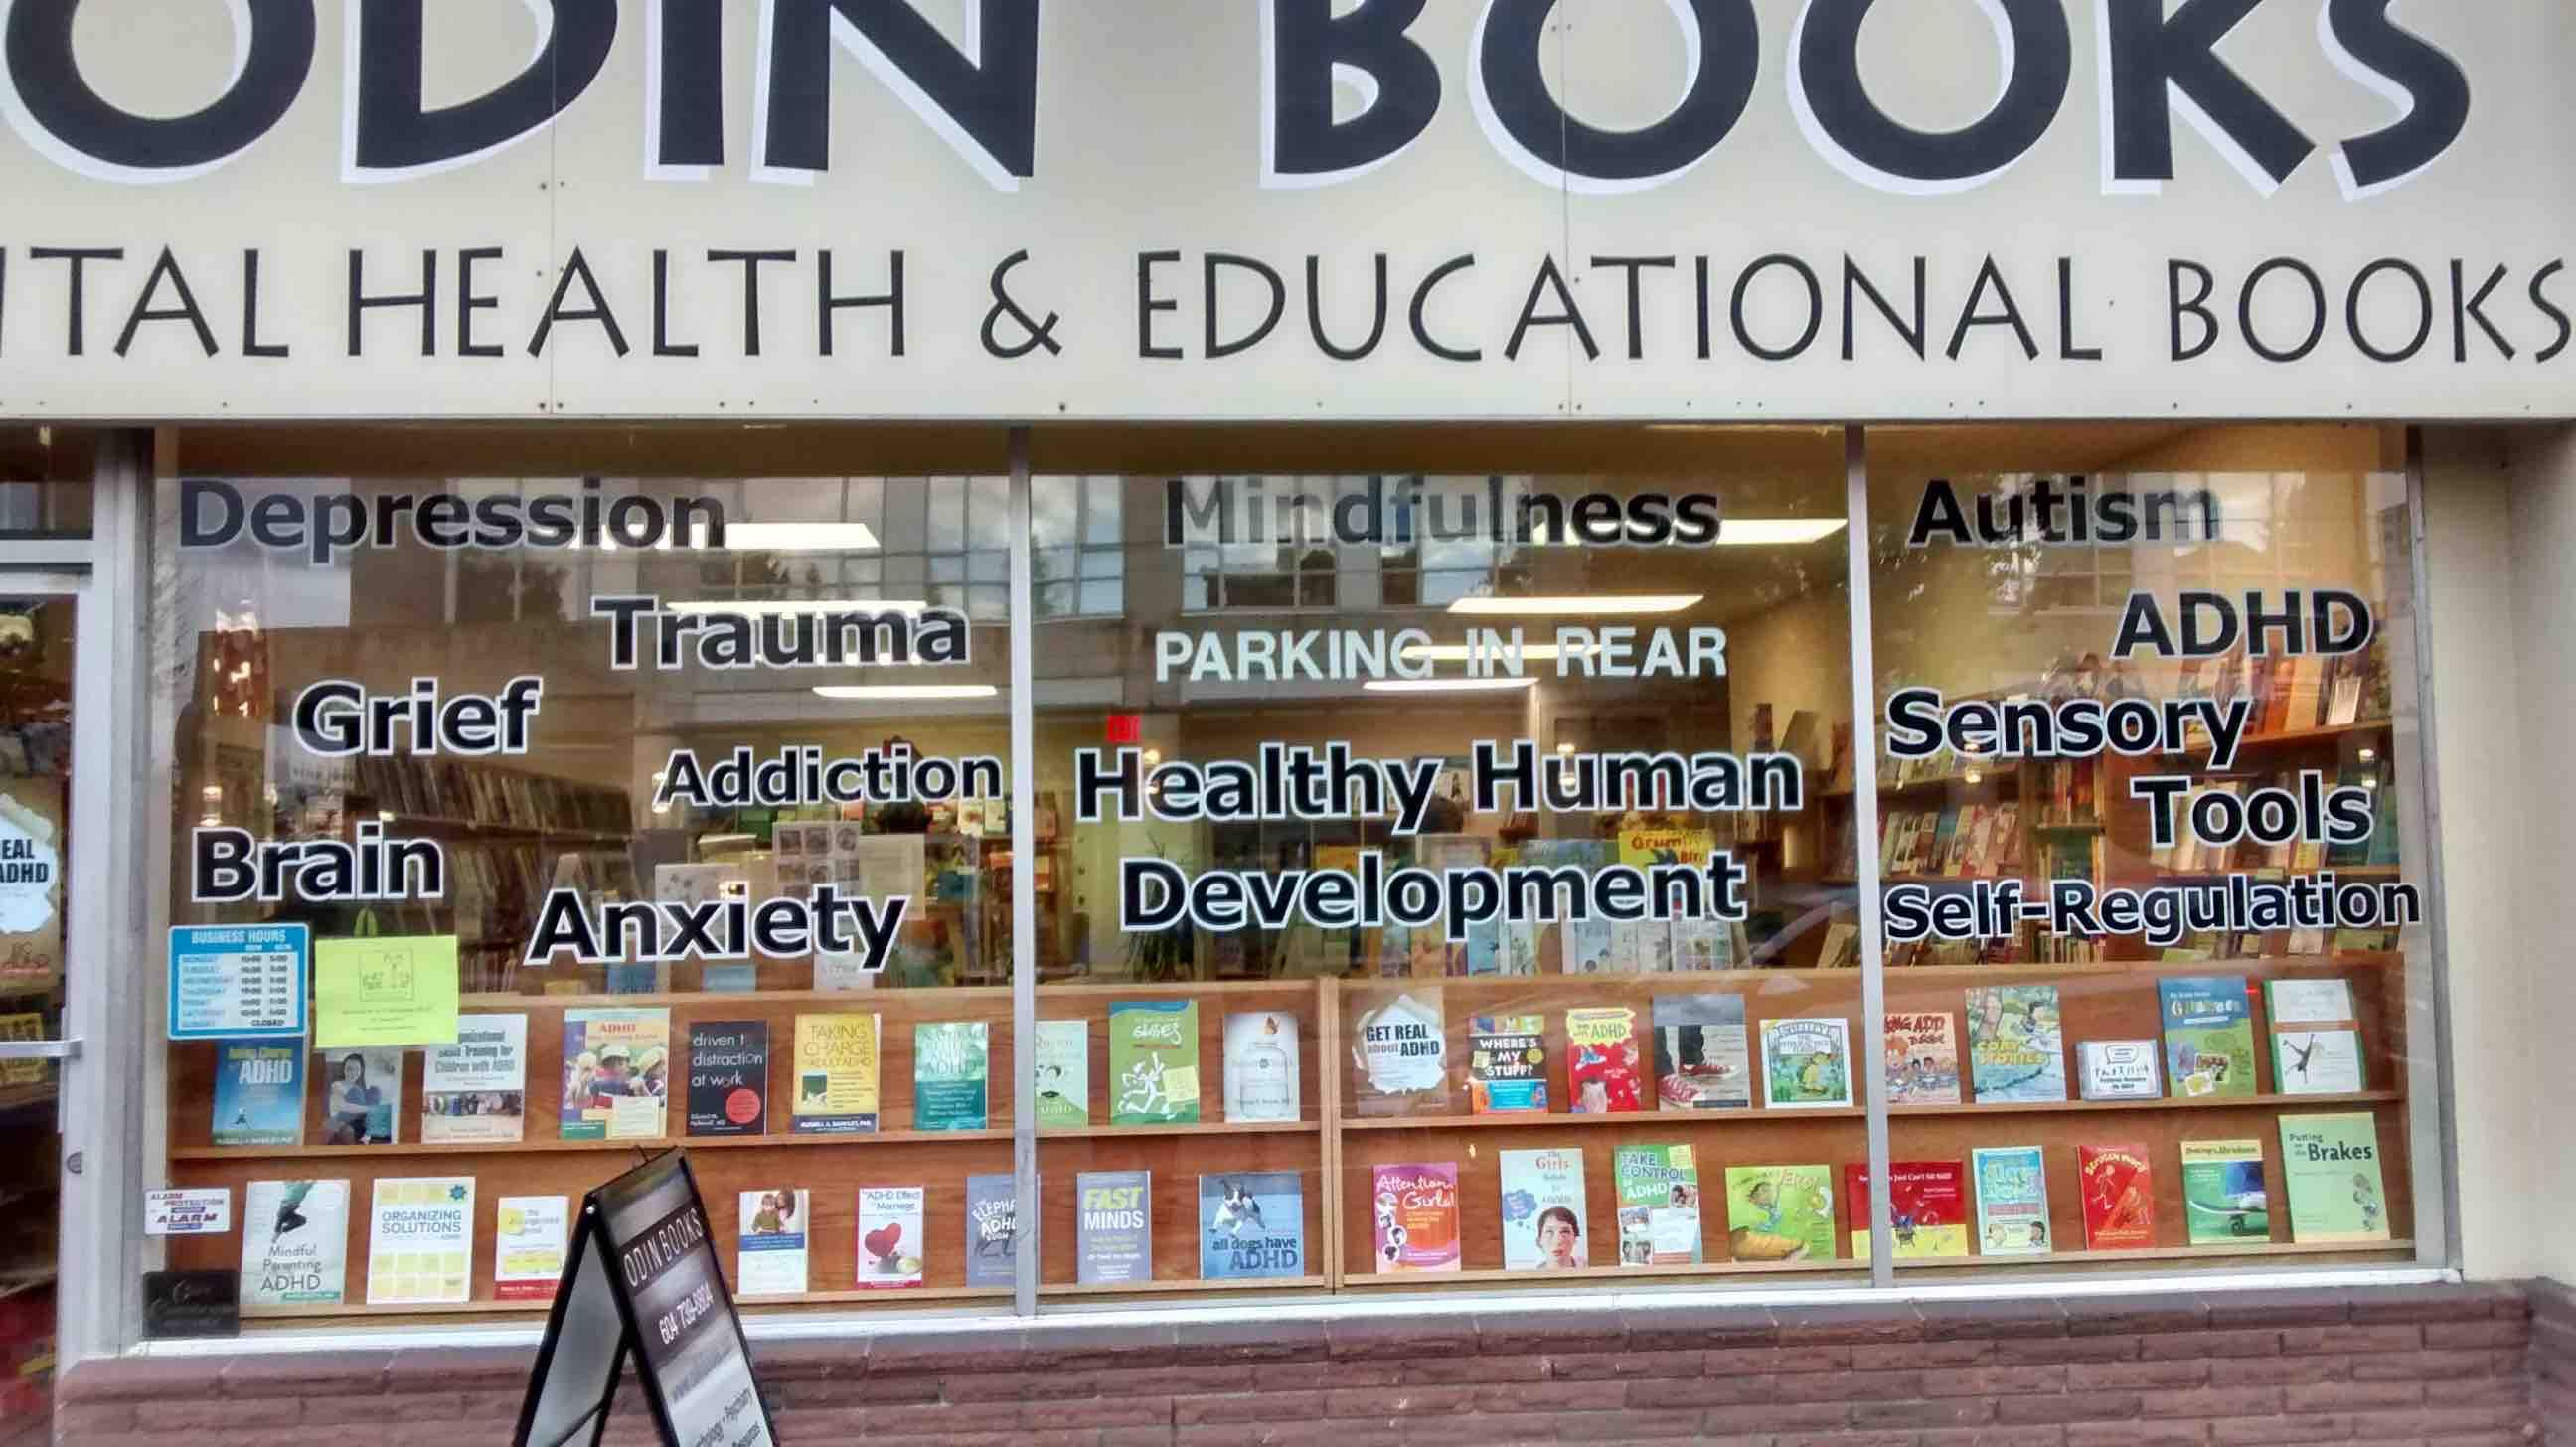 Odin books BC ADHD Awareness week book display photo 2015 #3